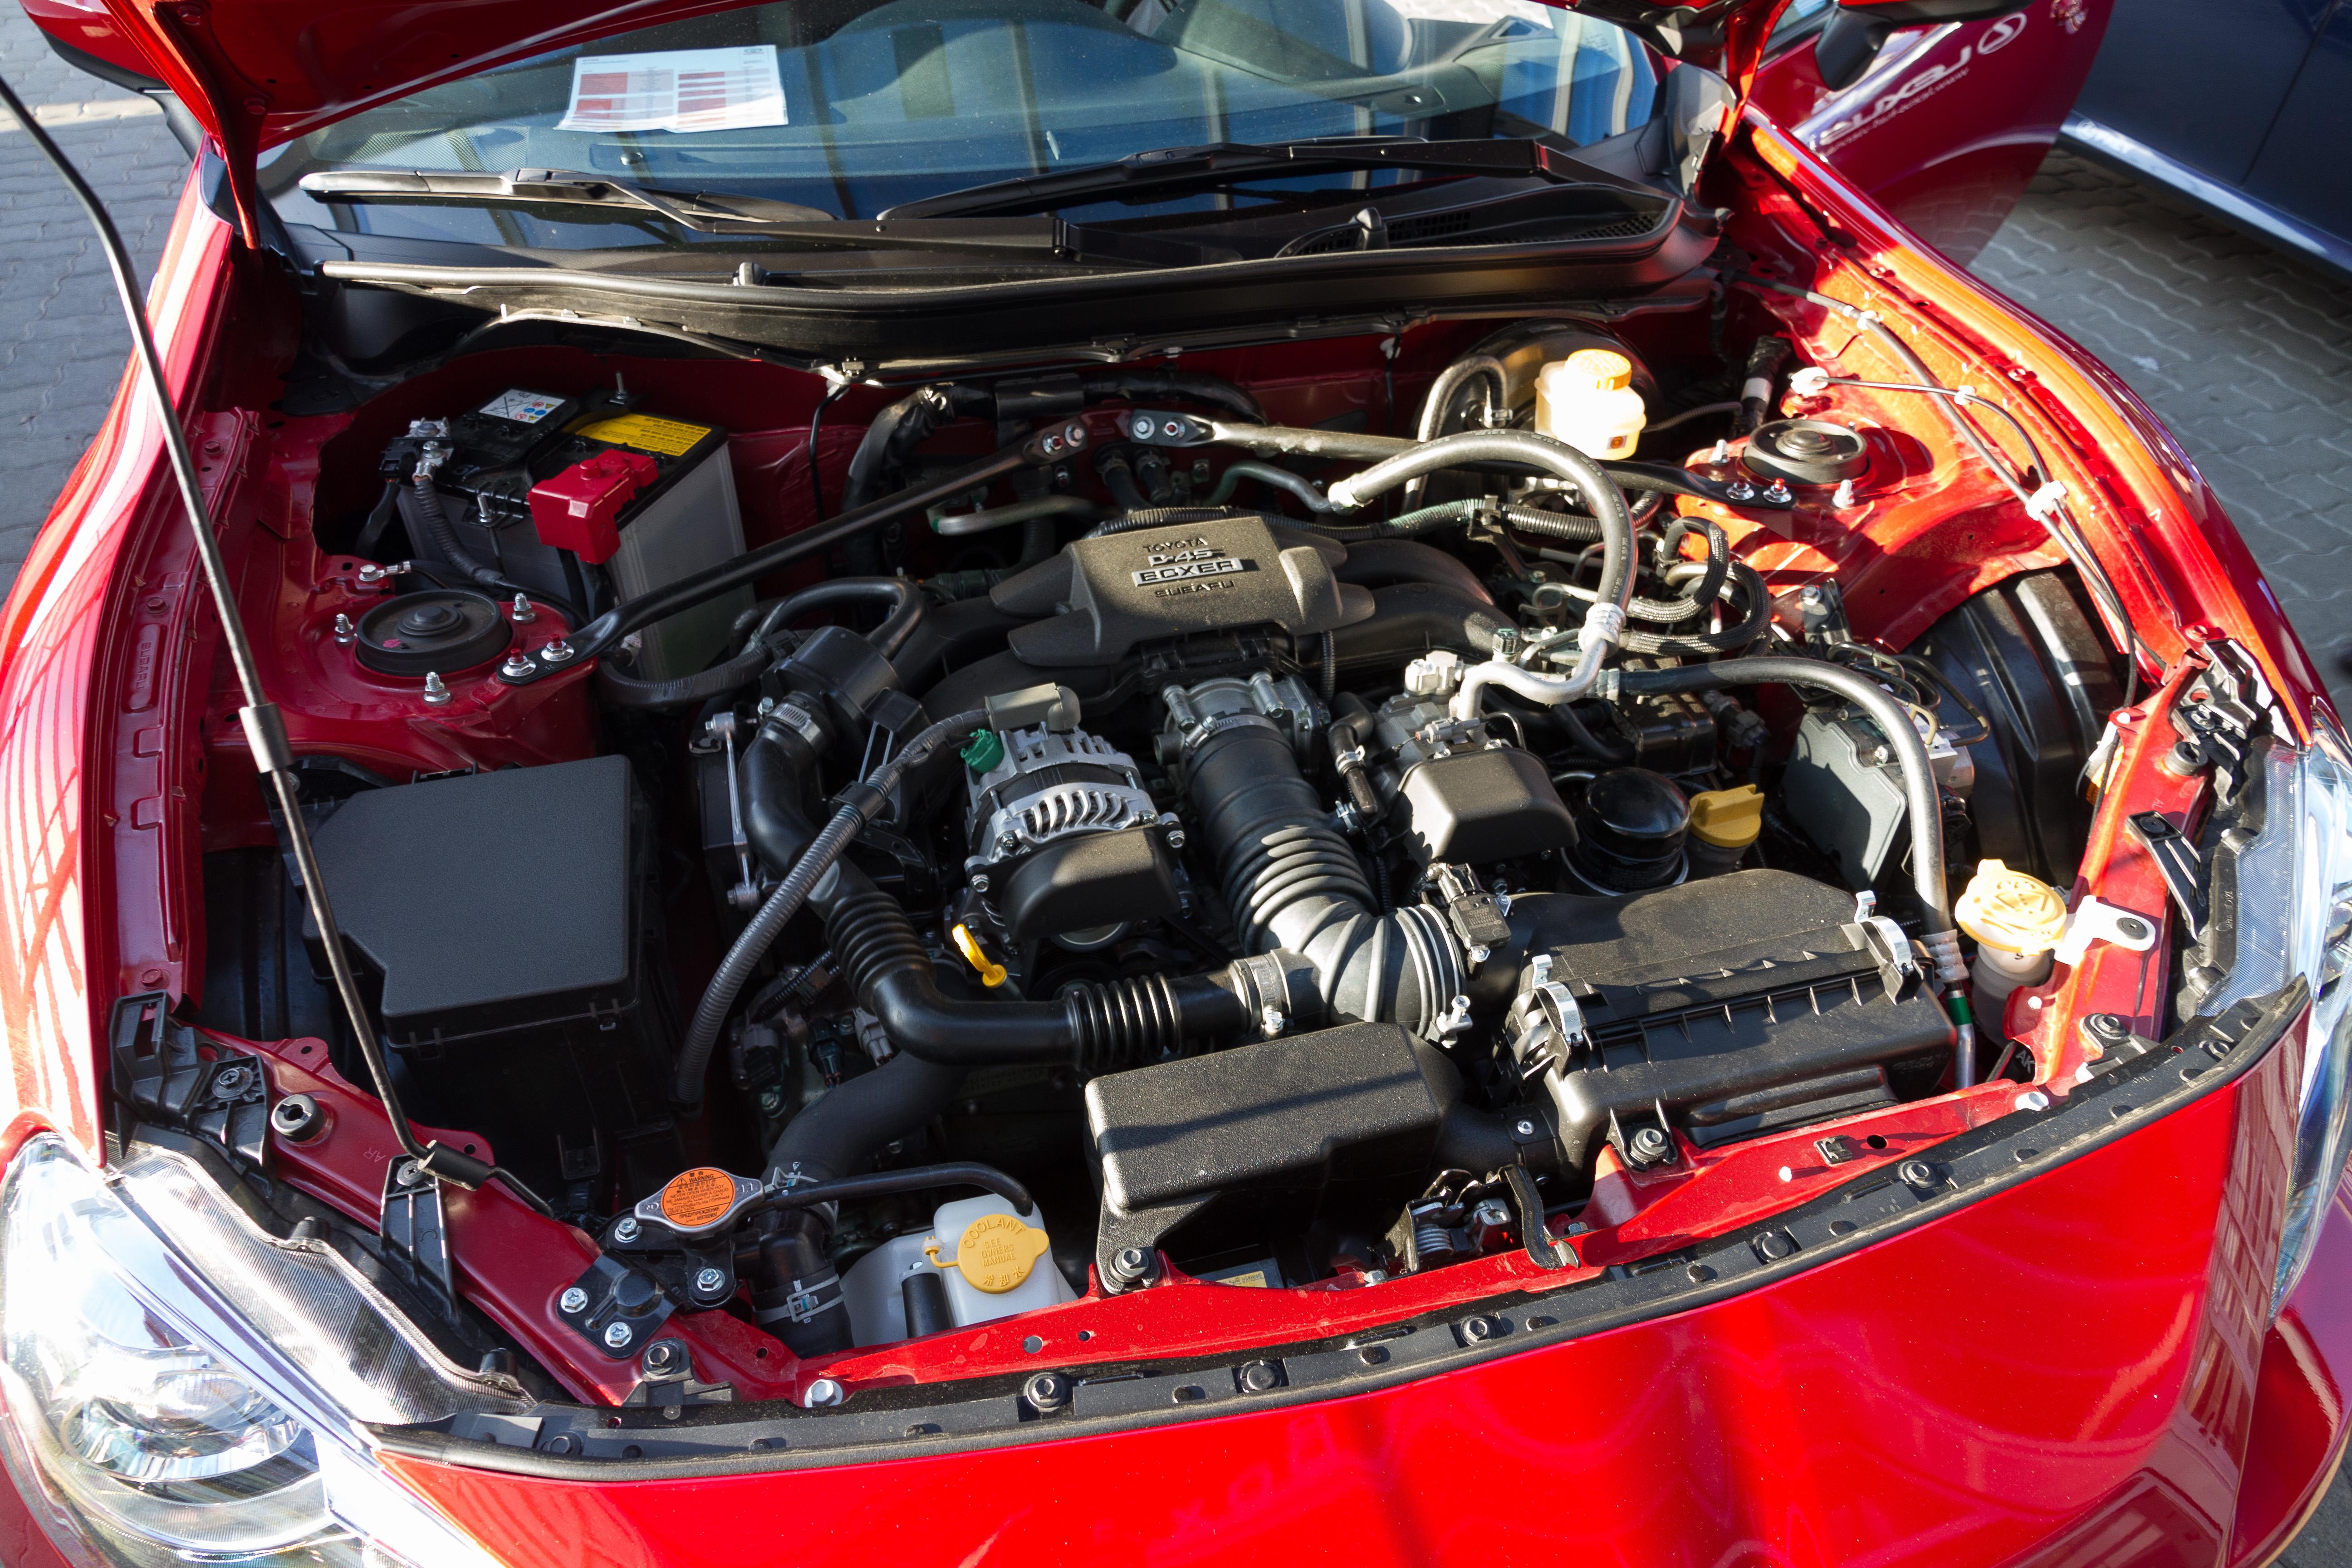 Toyota GT86 engine bay